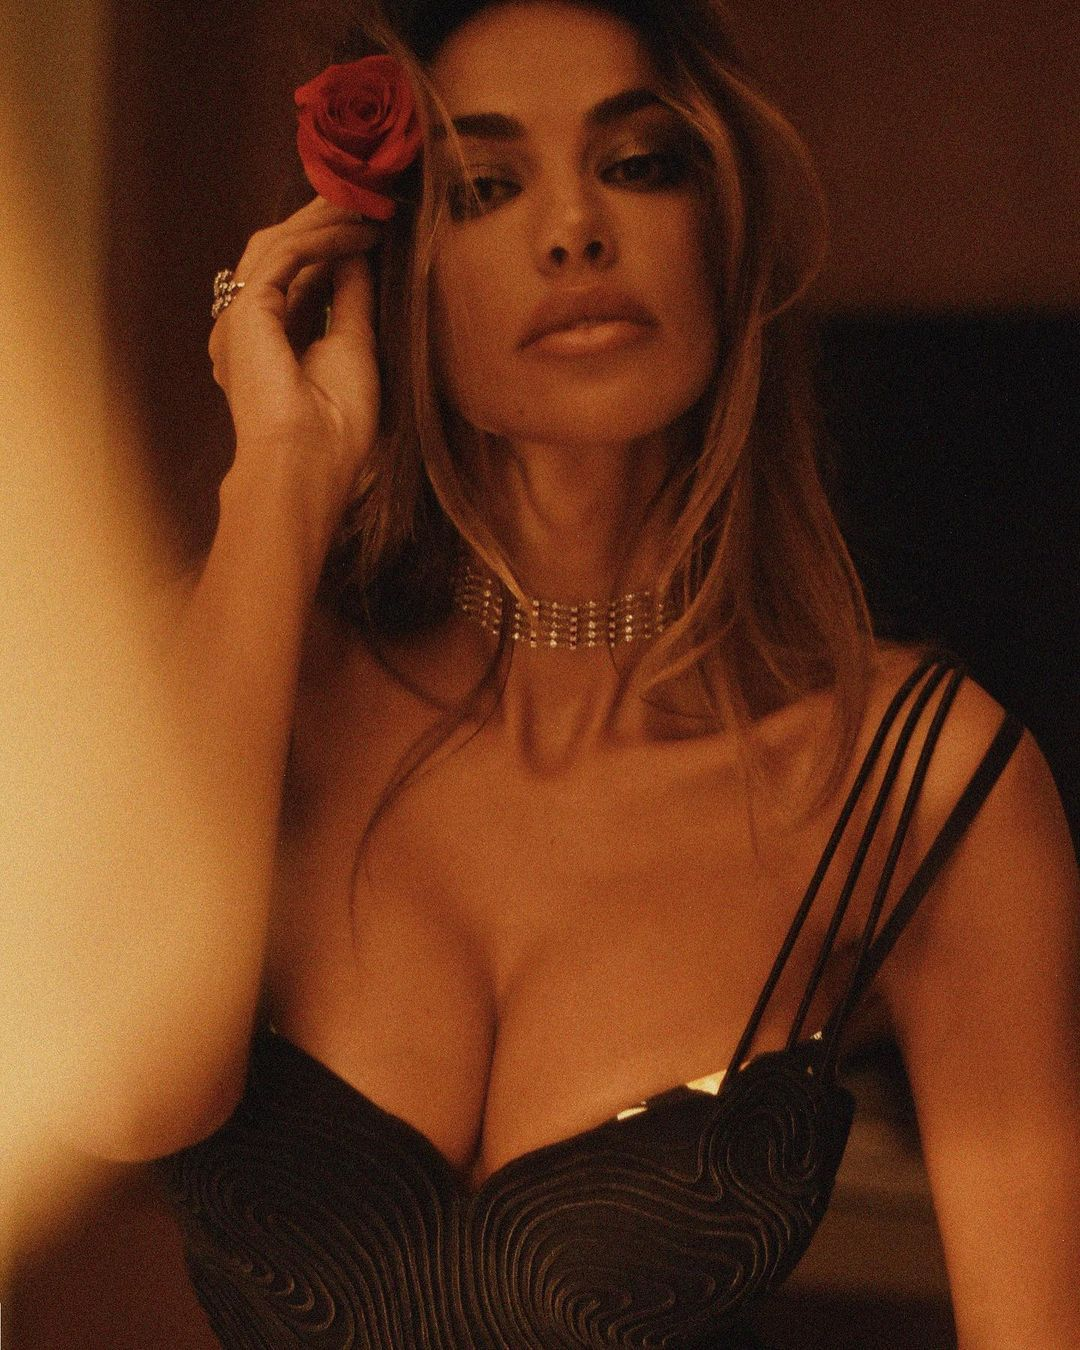 Madalina Diana Ghenea Gorgeous Body